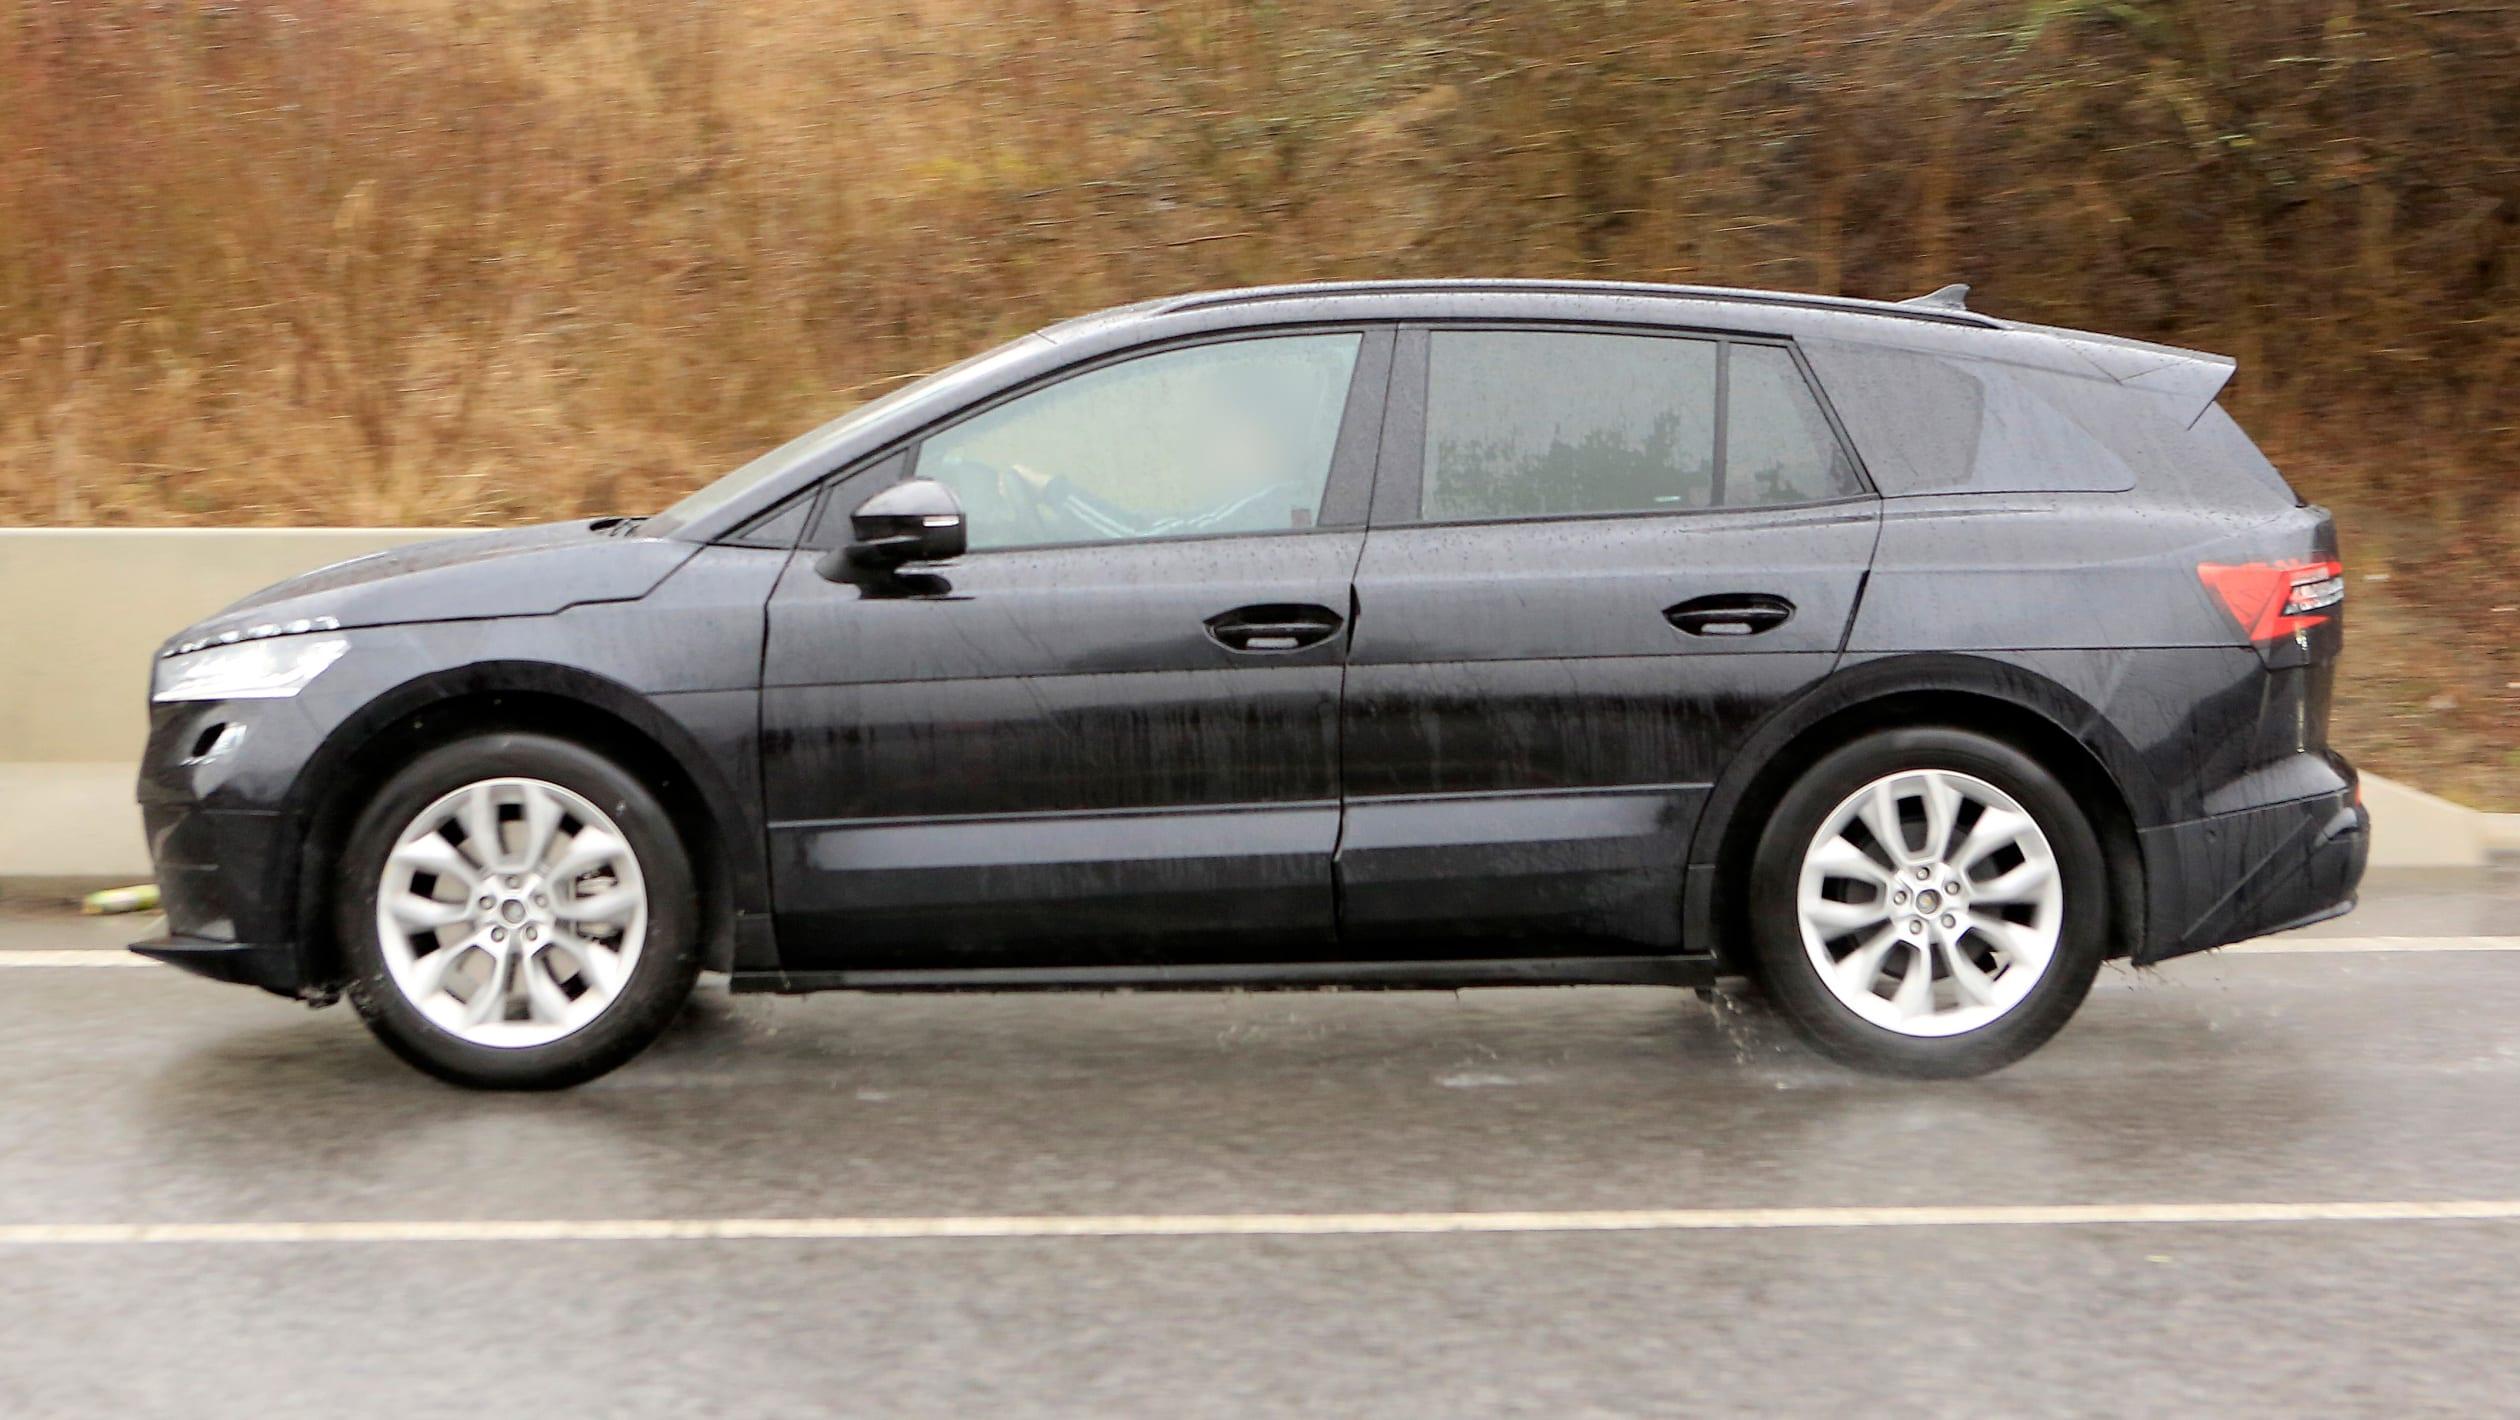 2021 - [Skoda] SUV EV - Page 3 2021%20Skoda%20Enyaq%20spied-6